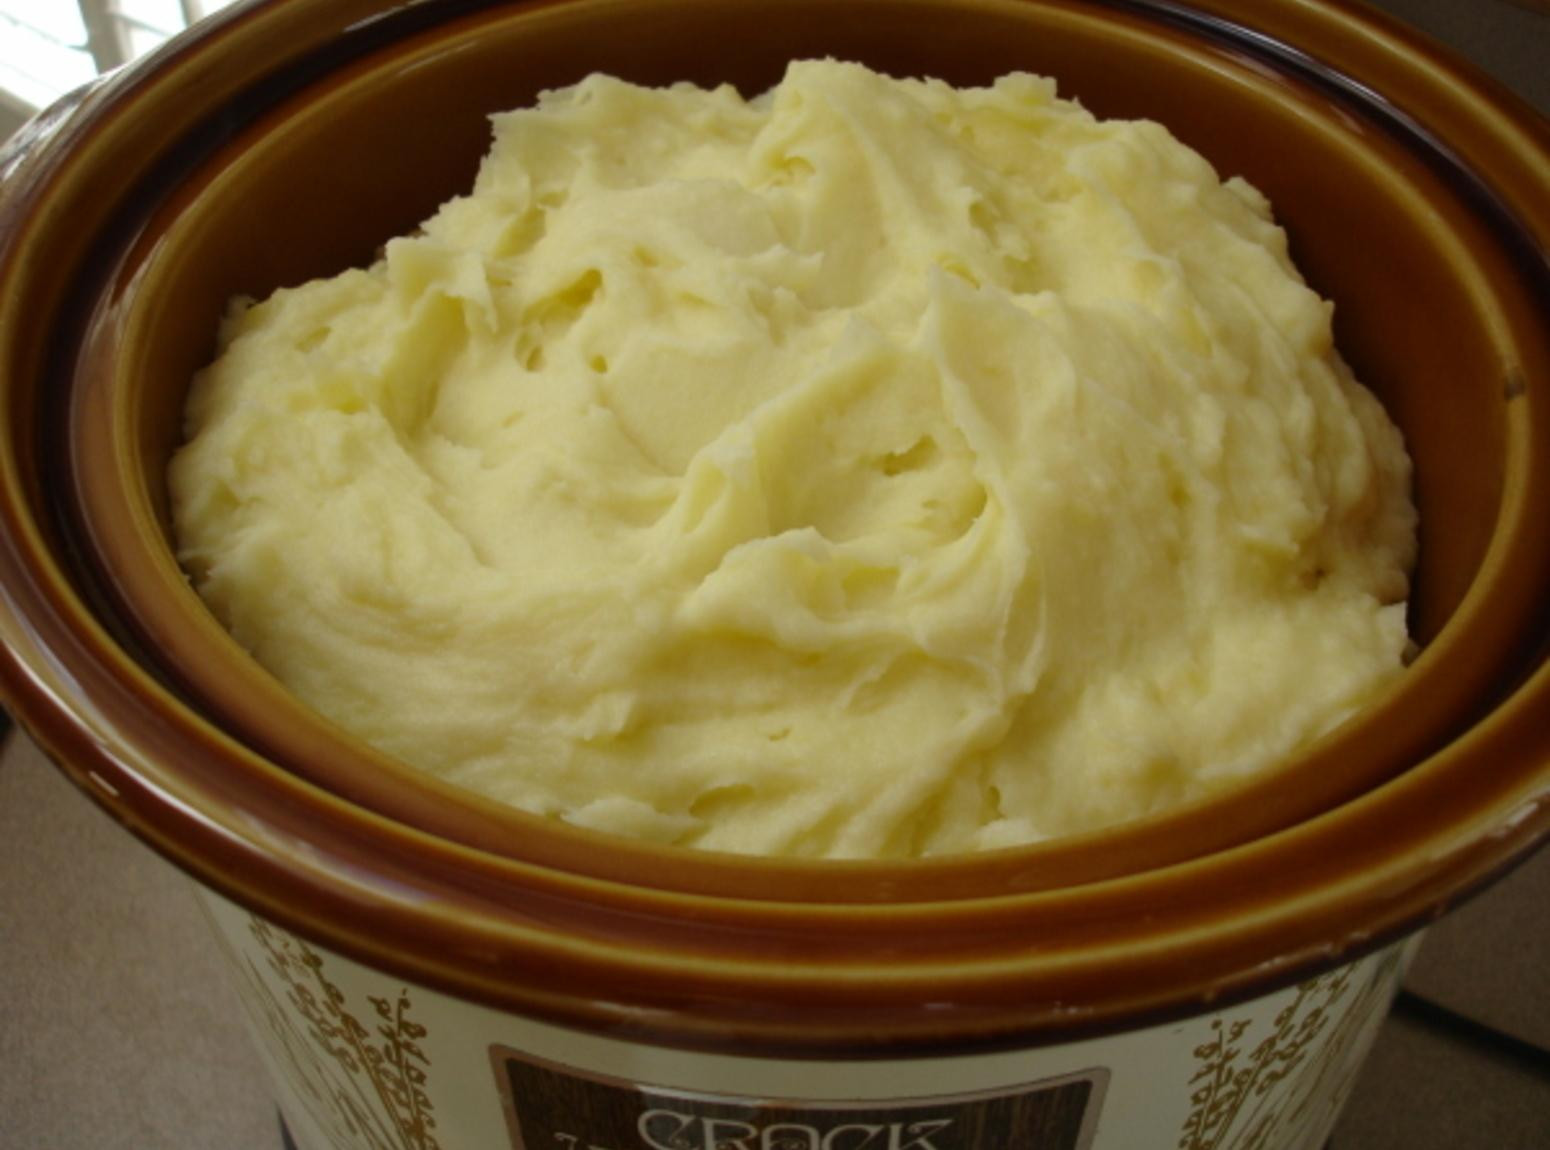 Crockpot Mashed Potatoes  Crock Pot Mashed Potatoes Recipe